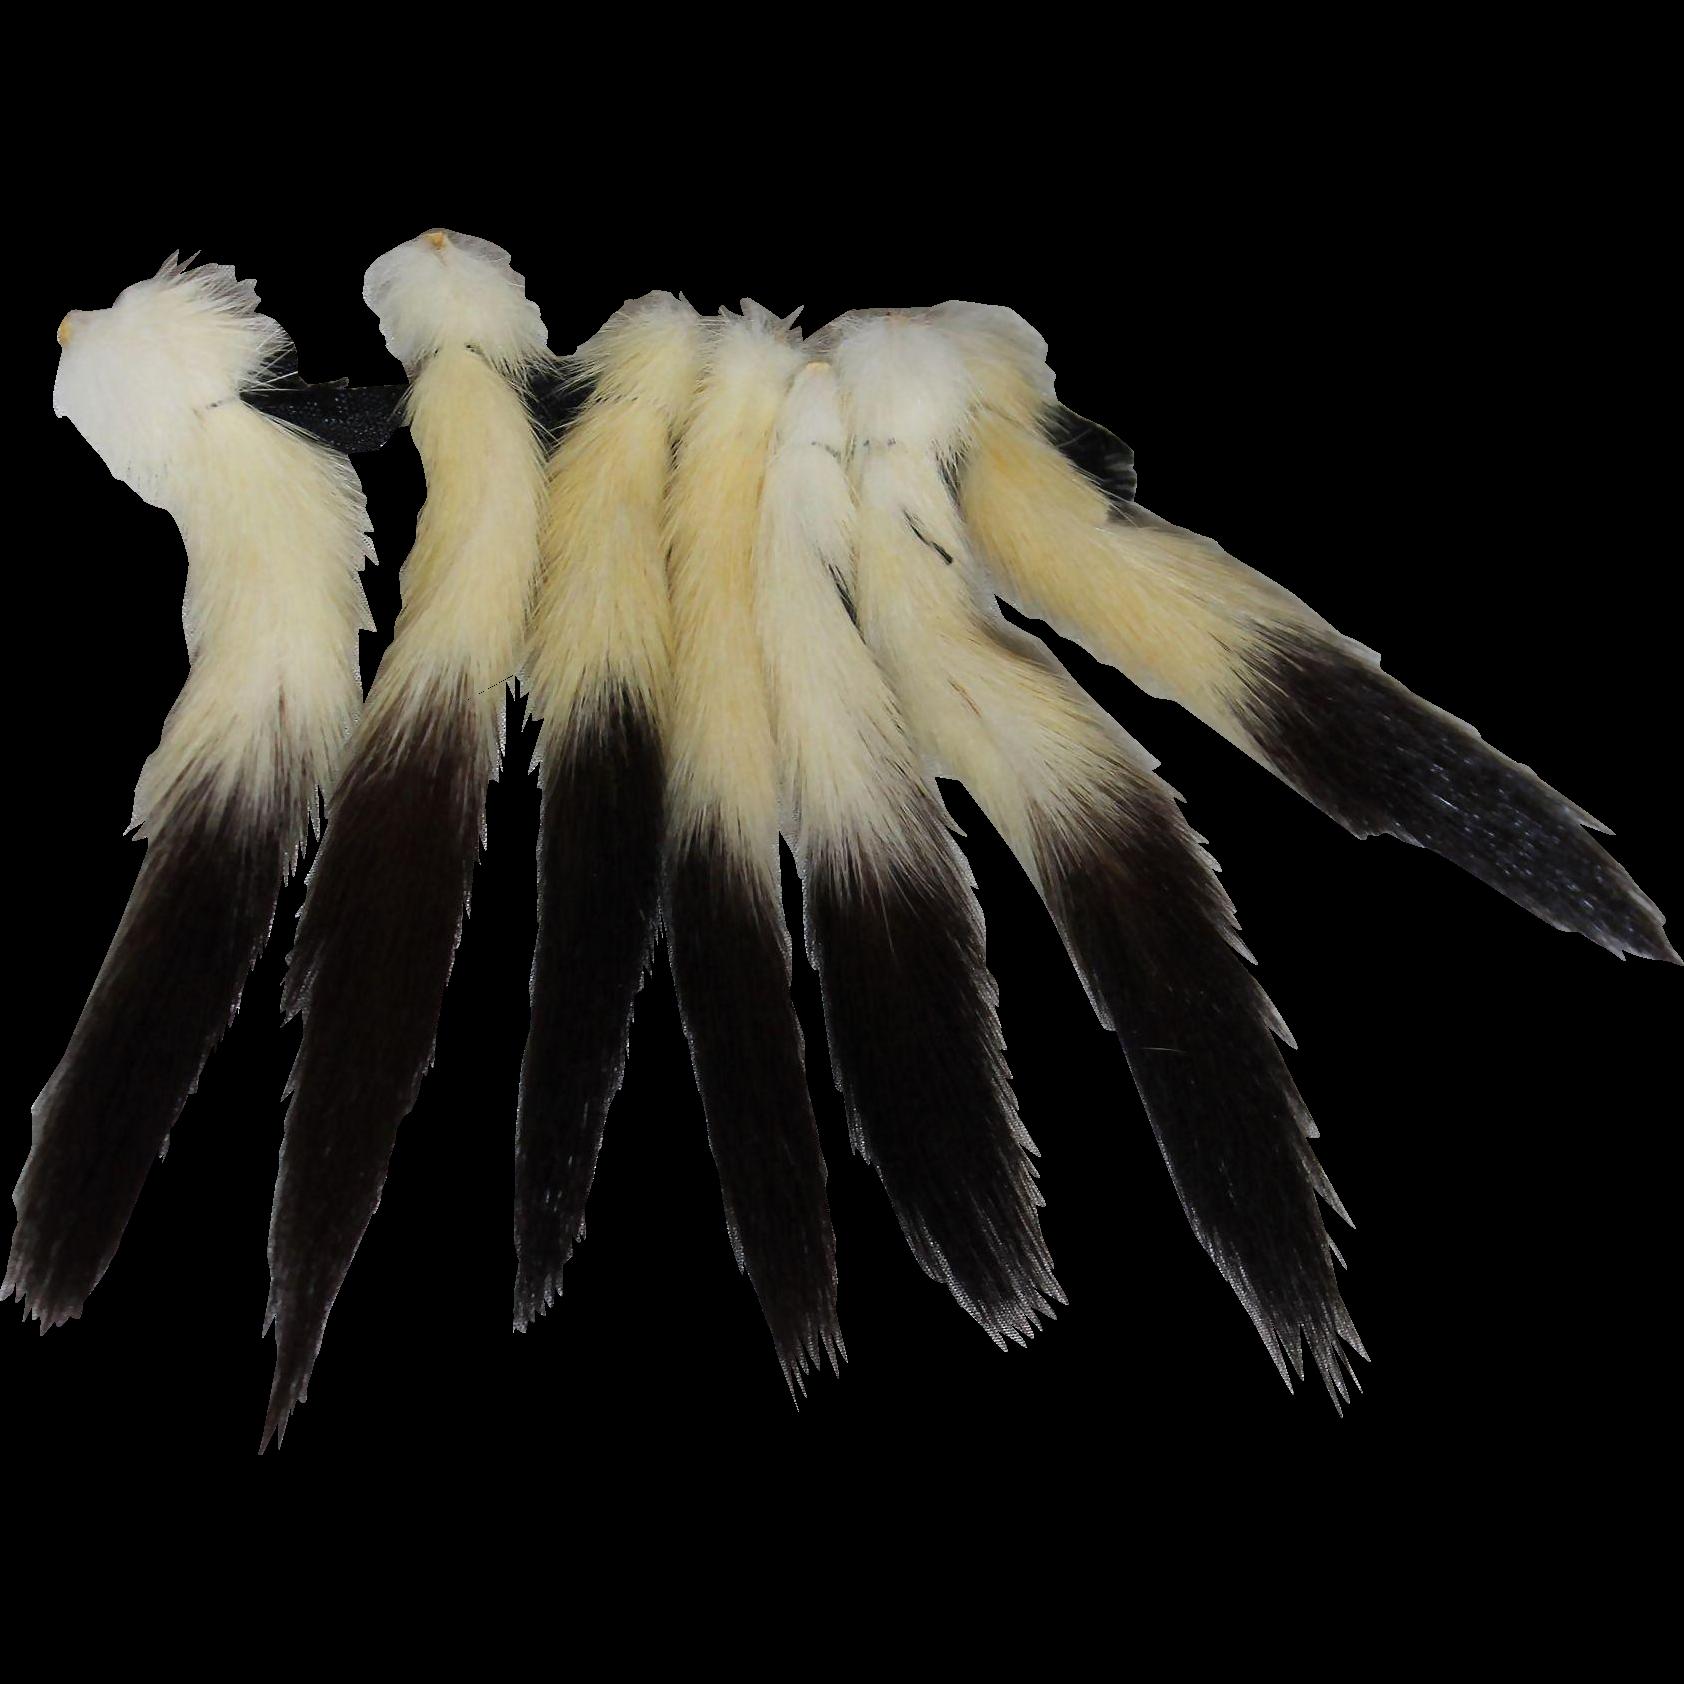 Miniature Antique Ermine Tails for Fashion